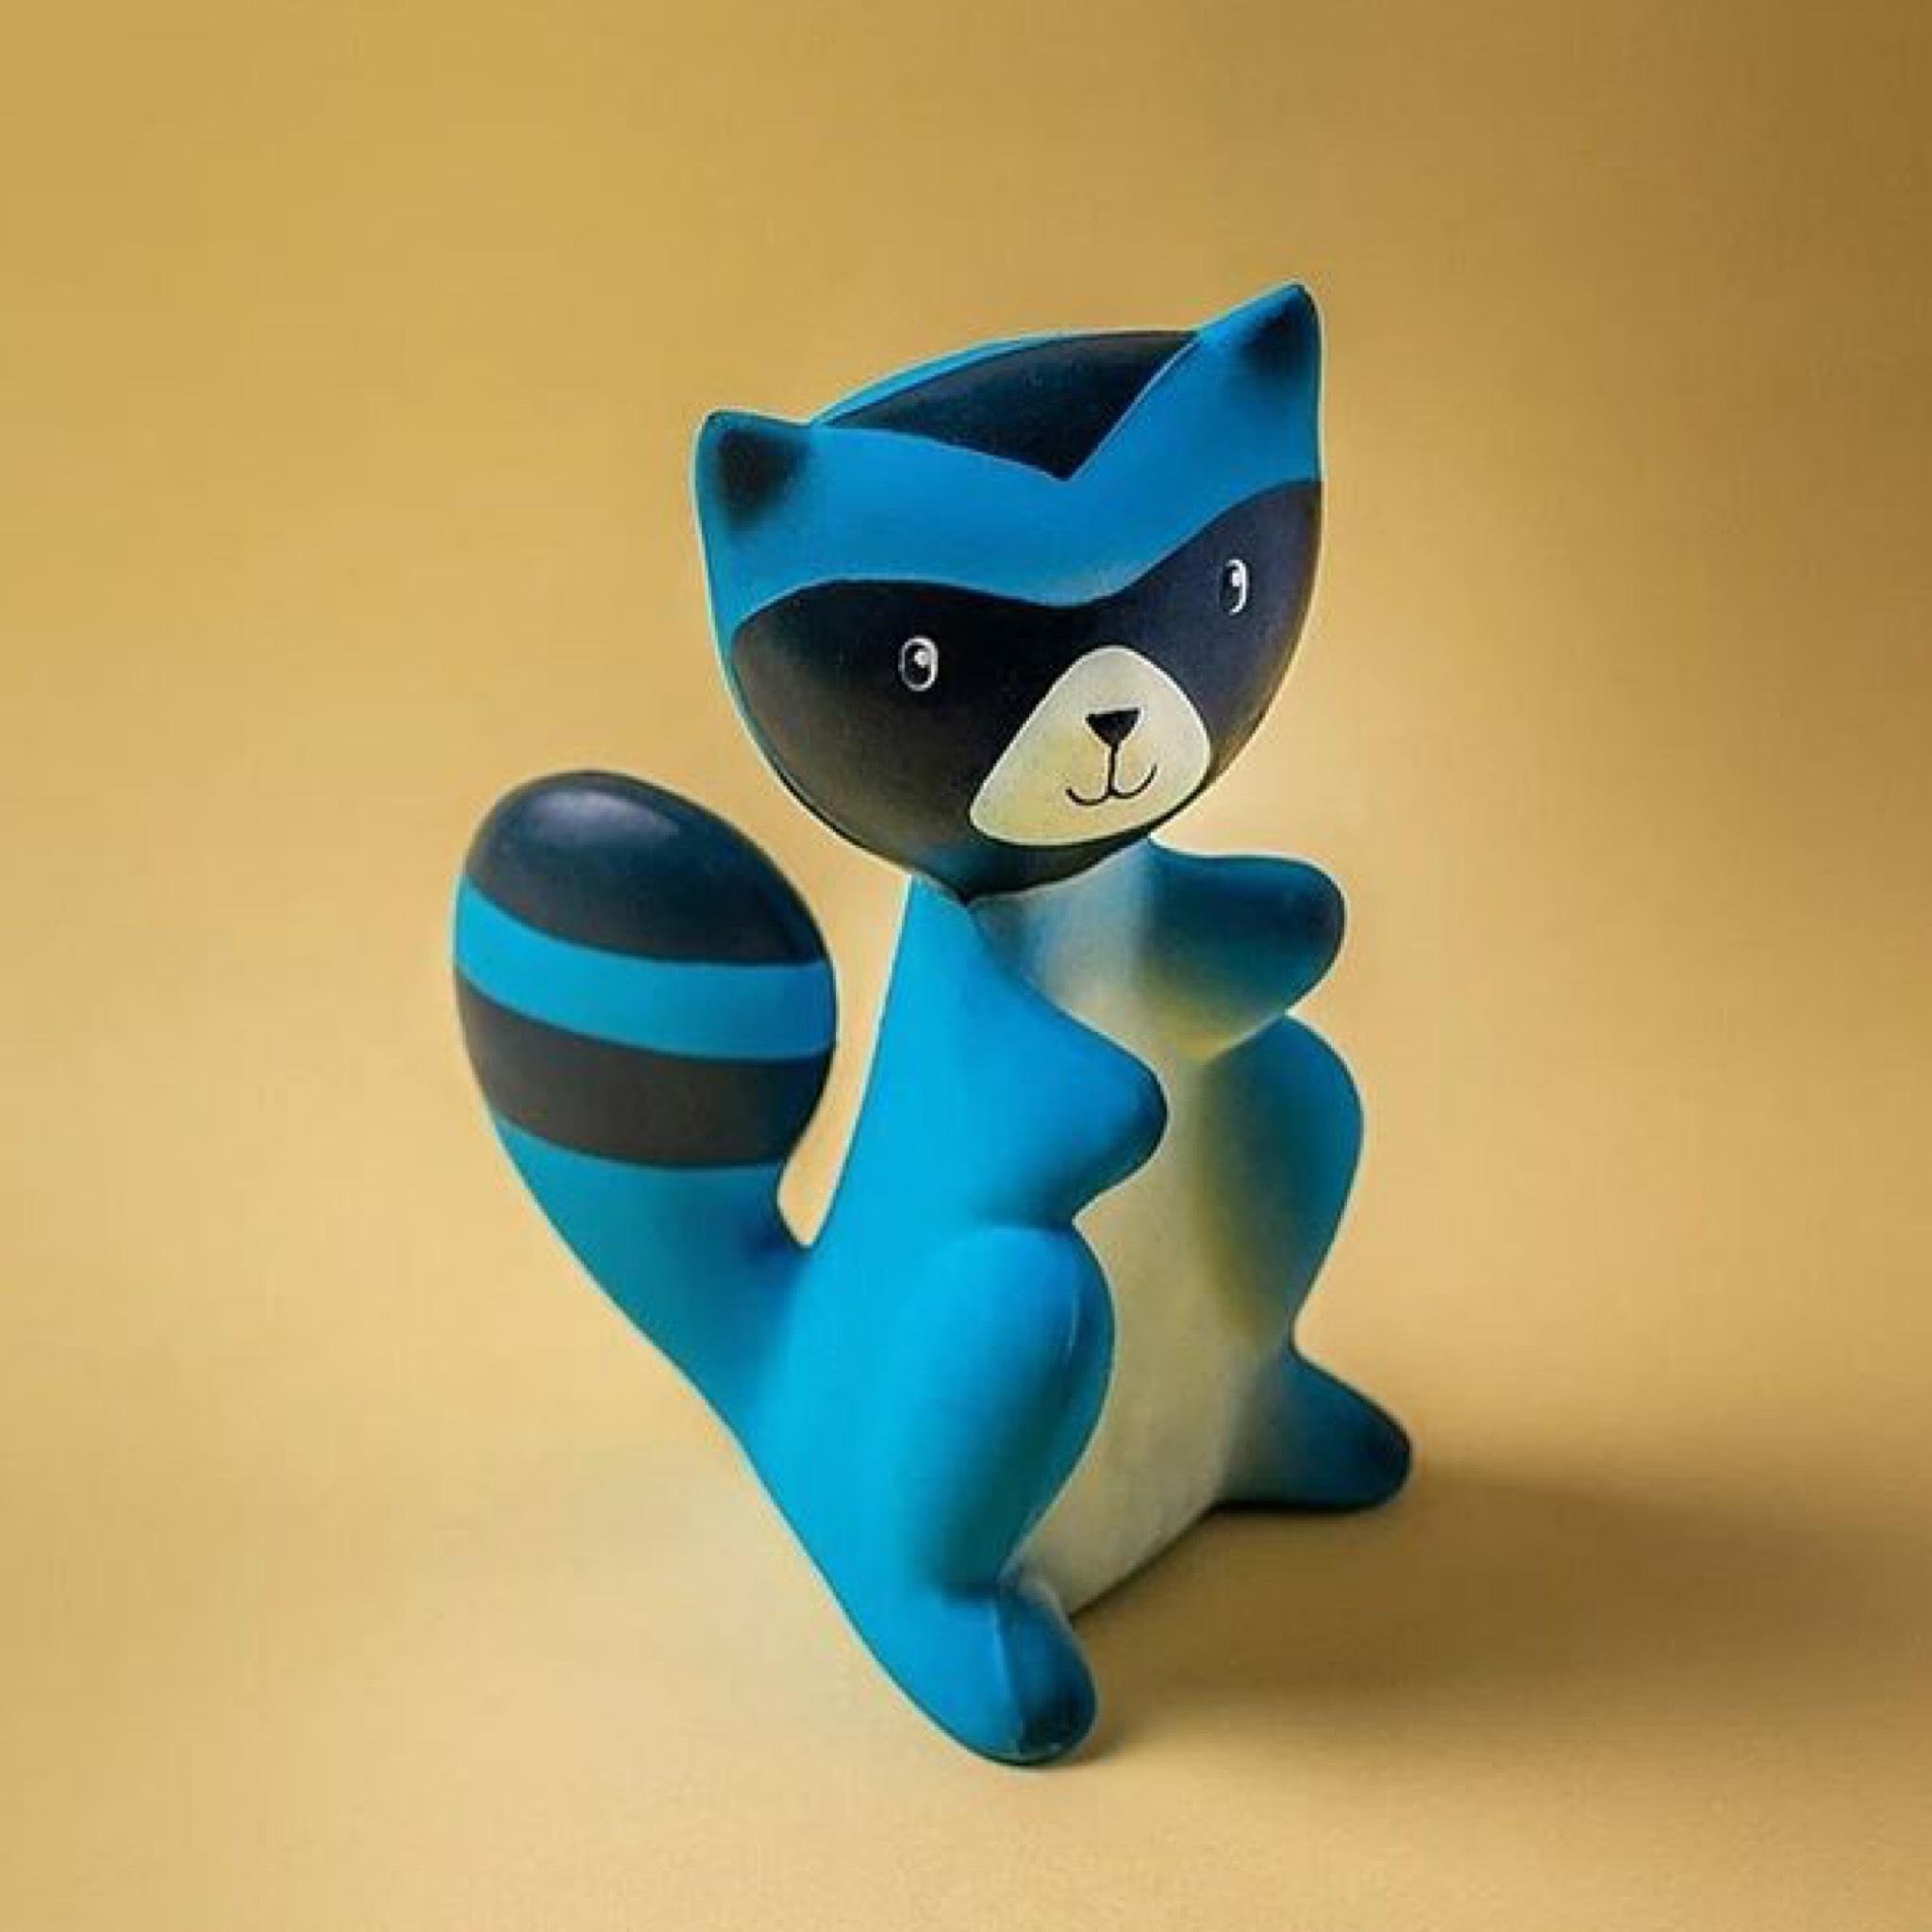 Игрушка-пищалка из натурального каучука Енот